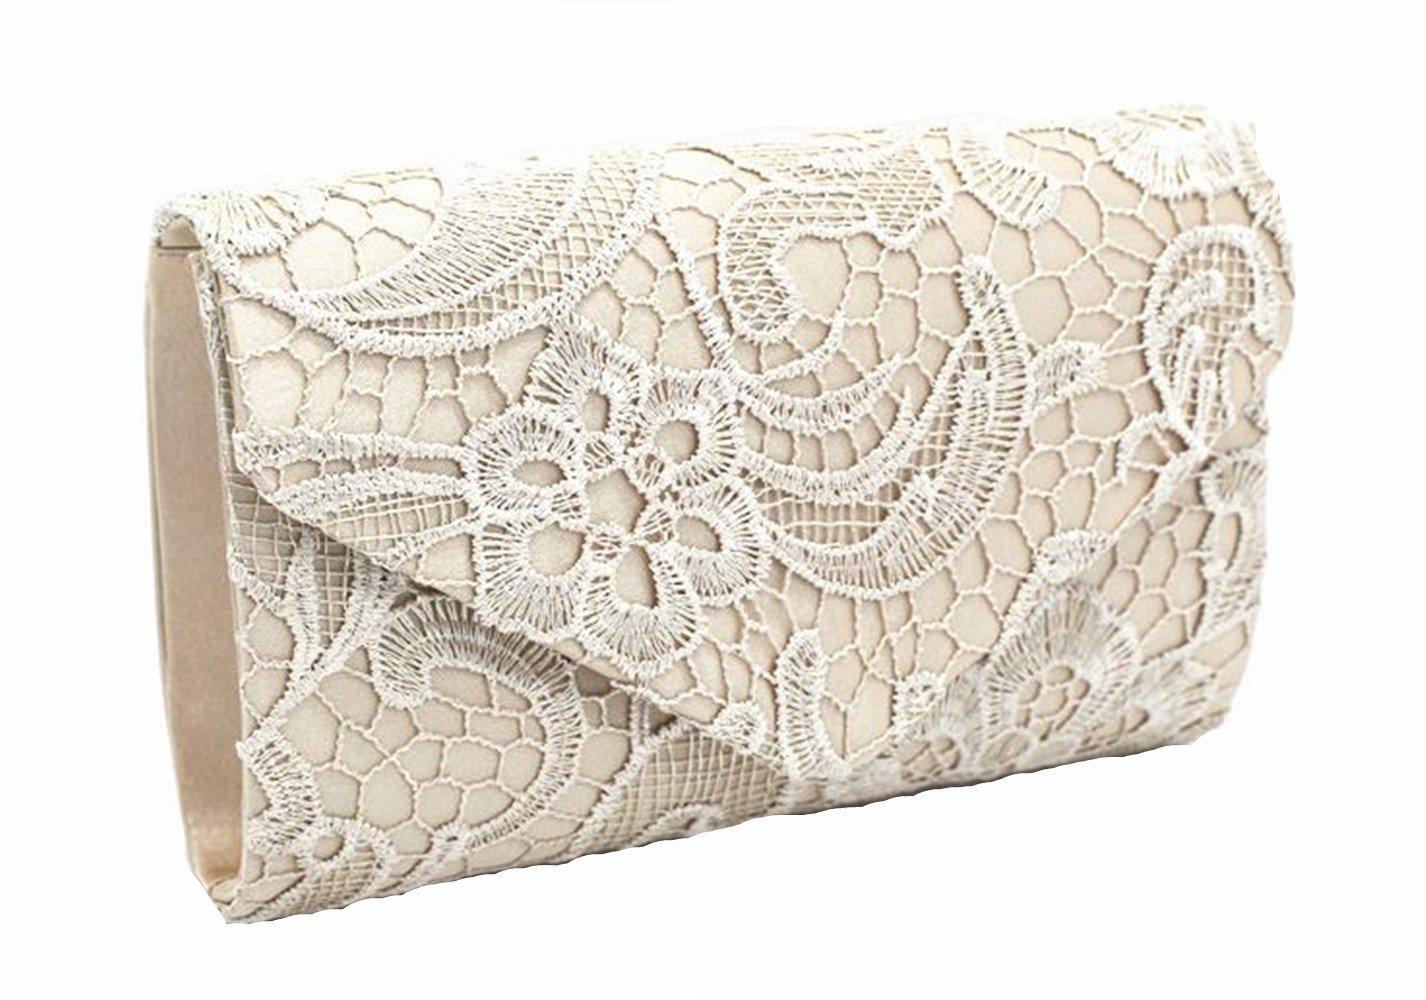 Nodykka Wedding Pleated Floral Lace Clutches Bag Evening Cross Body Handbags Purse